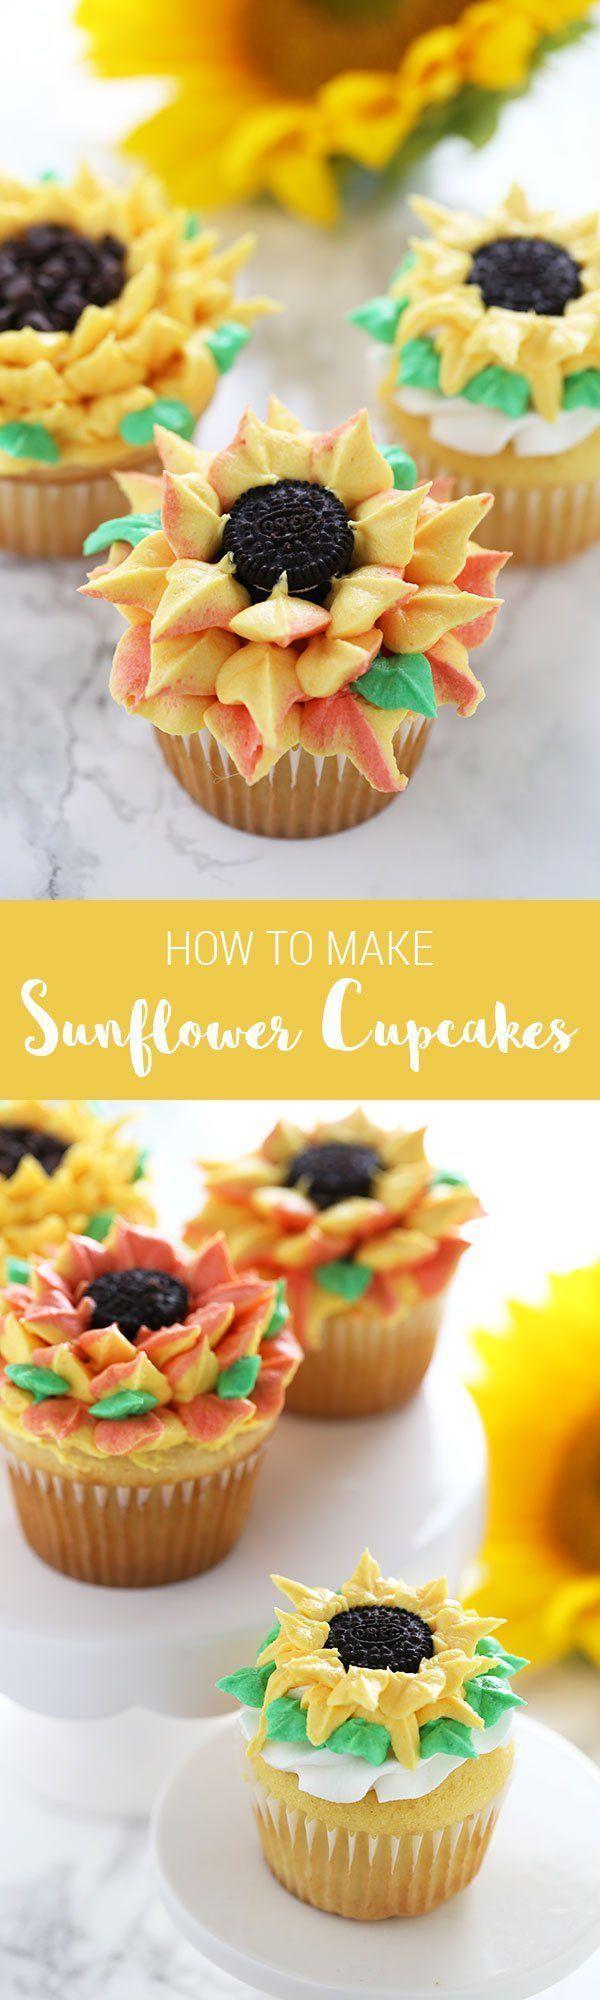 Decorate GORGEOUS fun sunflower cupcakes... ANYONE can do these!! #sunflowercupcakes Decorate GORGEOUS fun sunflower cupcakes... ANYONE can do these!! #sunflowercupcakes Decorate GORGEOUS fun sunflower cupcakes... ANYONE can do these!! #sunflowercupcakes Decorate GORGEOUS fun sunflower cupcakes... ANYONE can do these!! #sunflowercupcakes Decorate GORGEOUS fun sunflower cupcakes... ANYONE can do these!! #sunflowercupcakes Decorate GORGEOUS fun sunflower cupcakes... ANYONE can do these!! #sunflowe #sunflowercupcakes